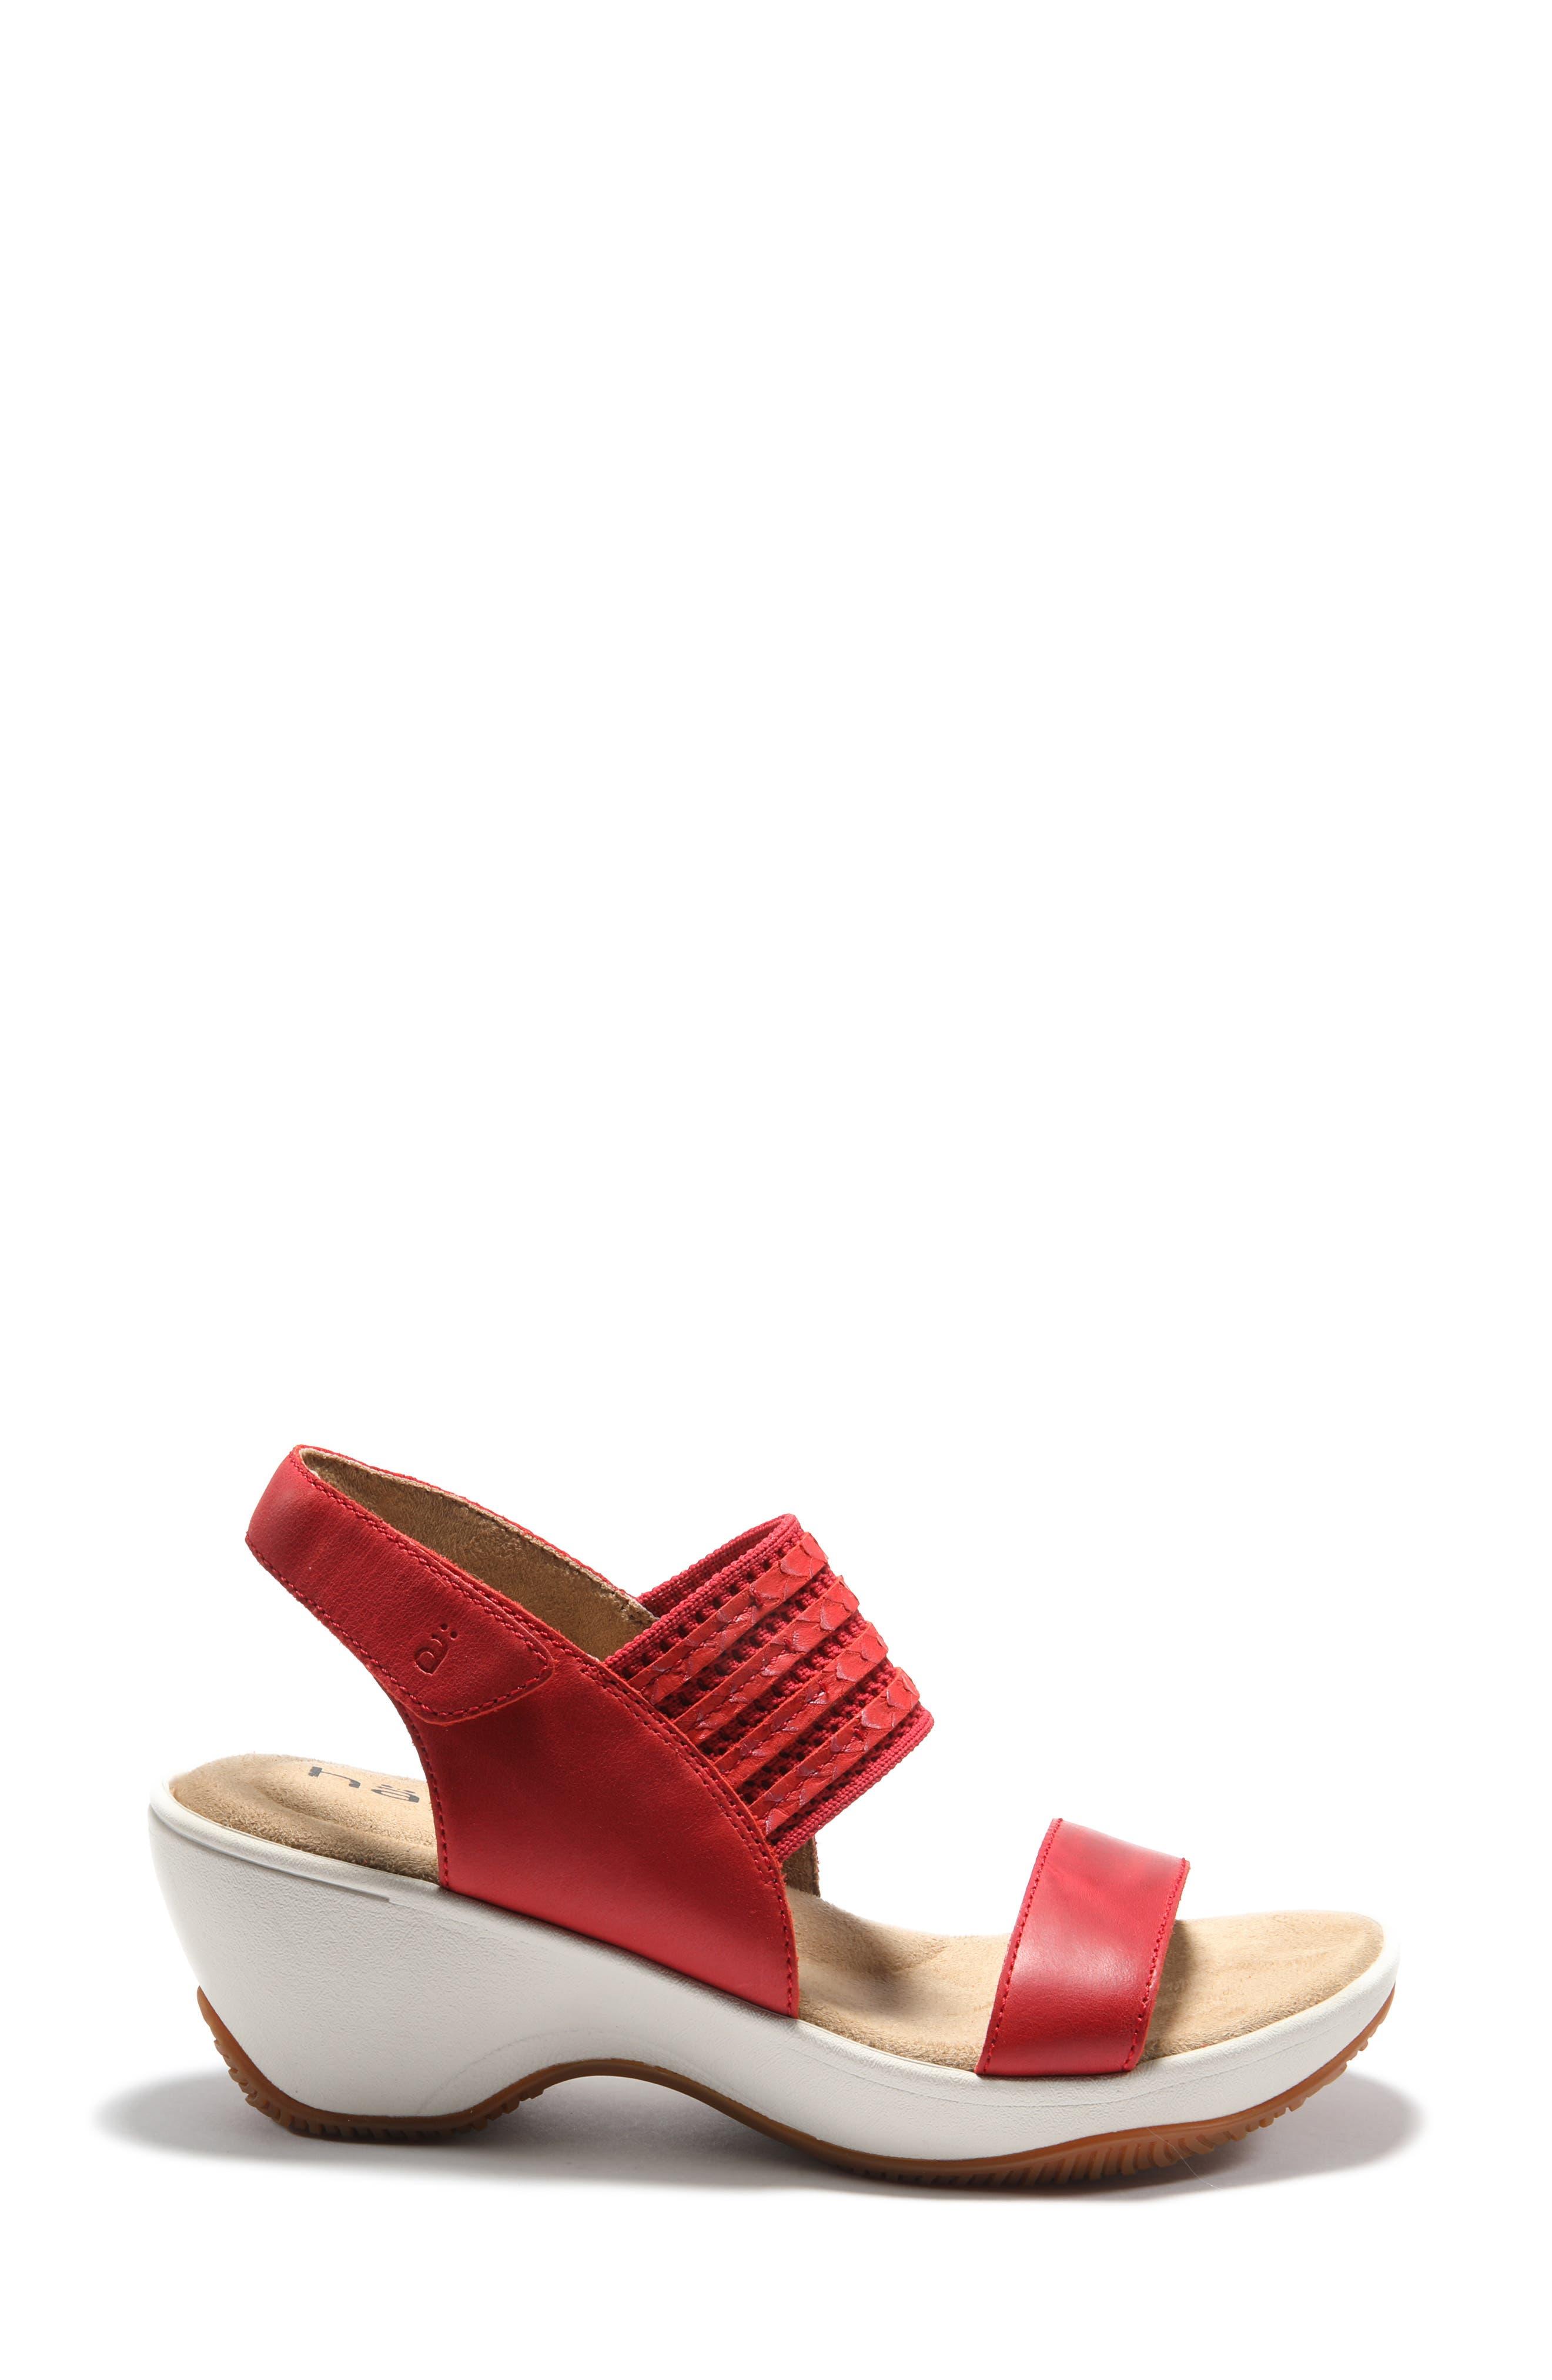 Halsa Footwear Halsa Chantal Slingback Sandal